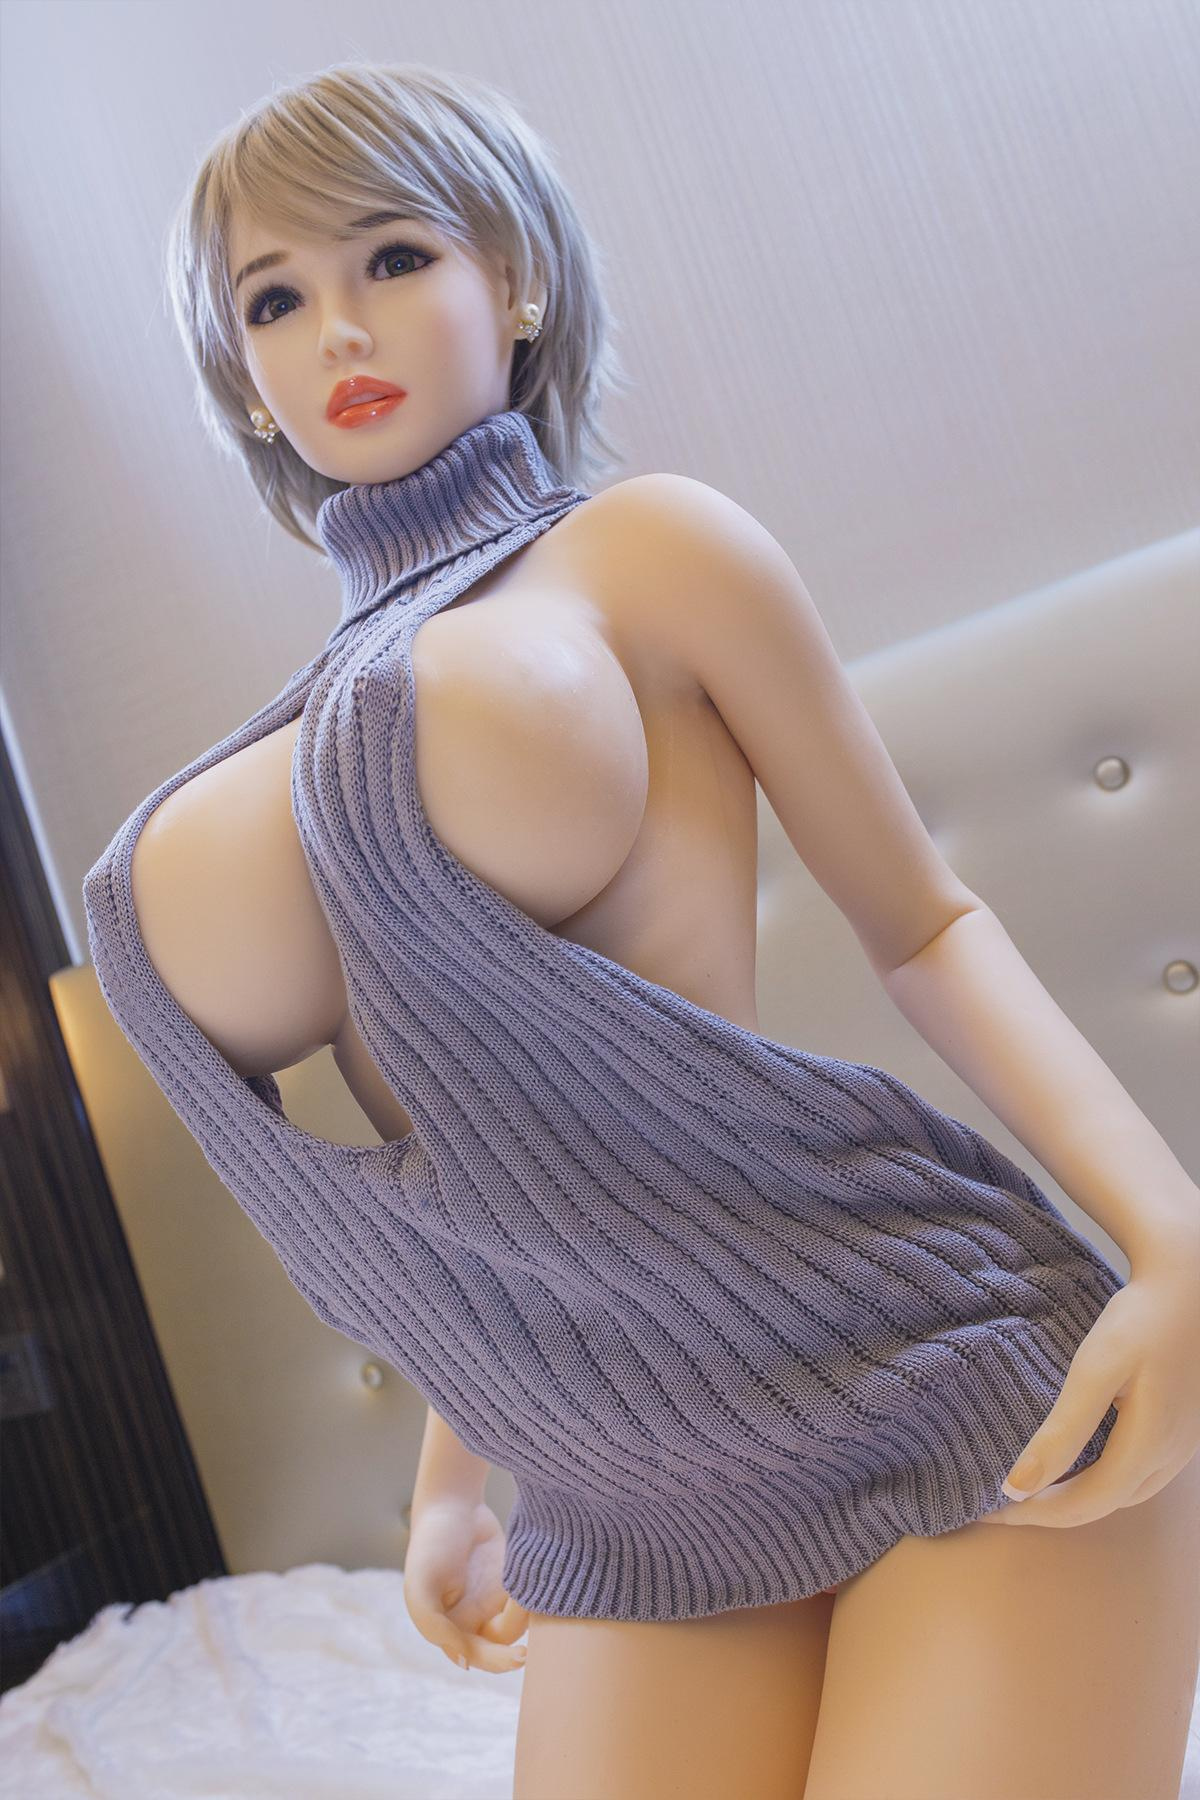 MenSex 장난감에 대한 실제 섹스 인형 일본어 풍선 세미 - 고체 실리콘 인형 구강 사랑 인형 질 성인 전체 생활 장난감을